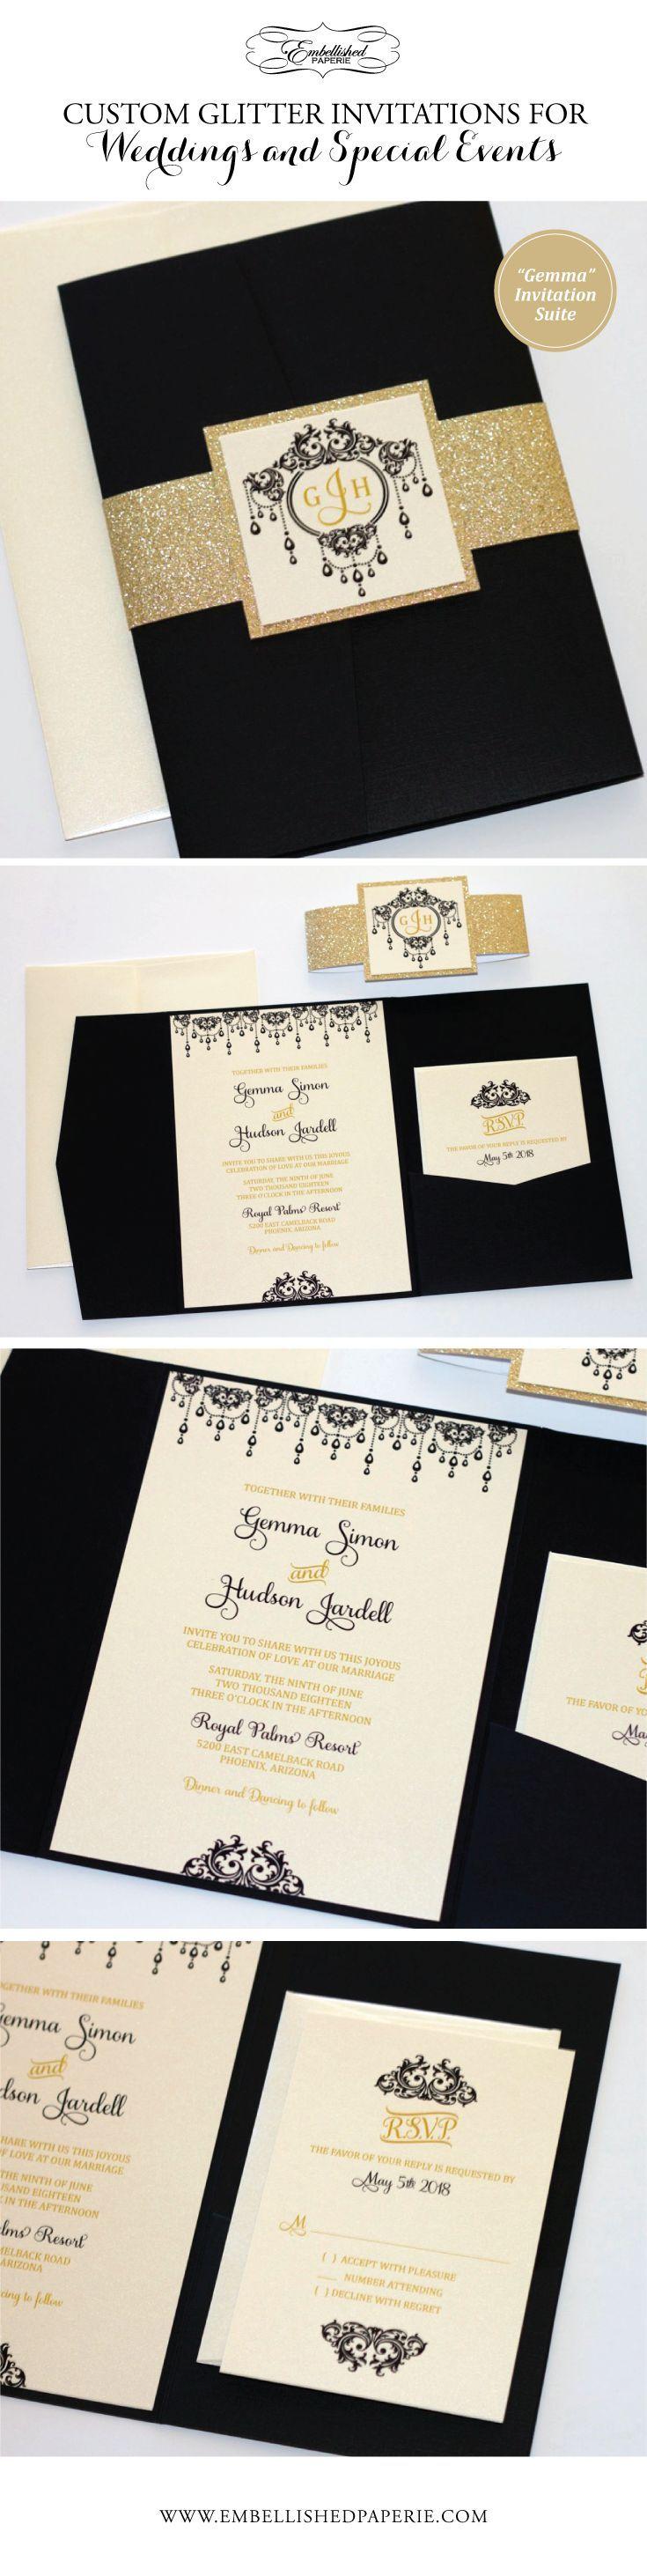 51 best wedding invitations pocket images on pinterest